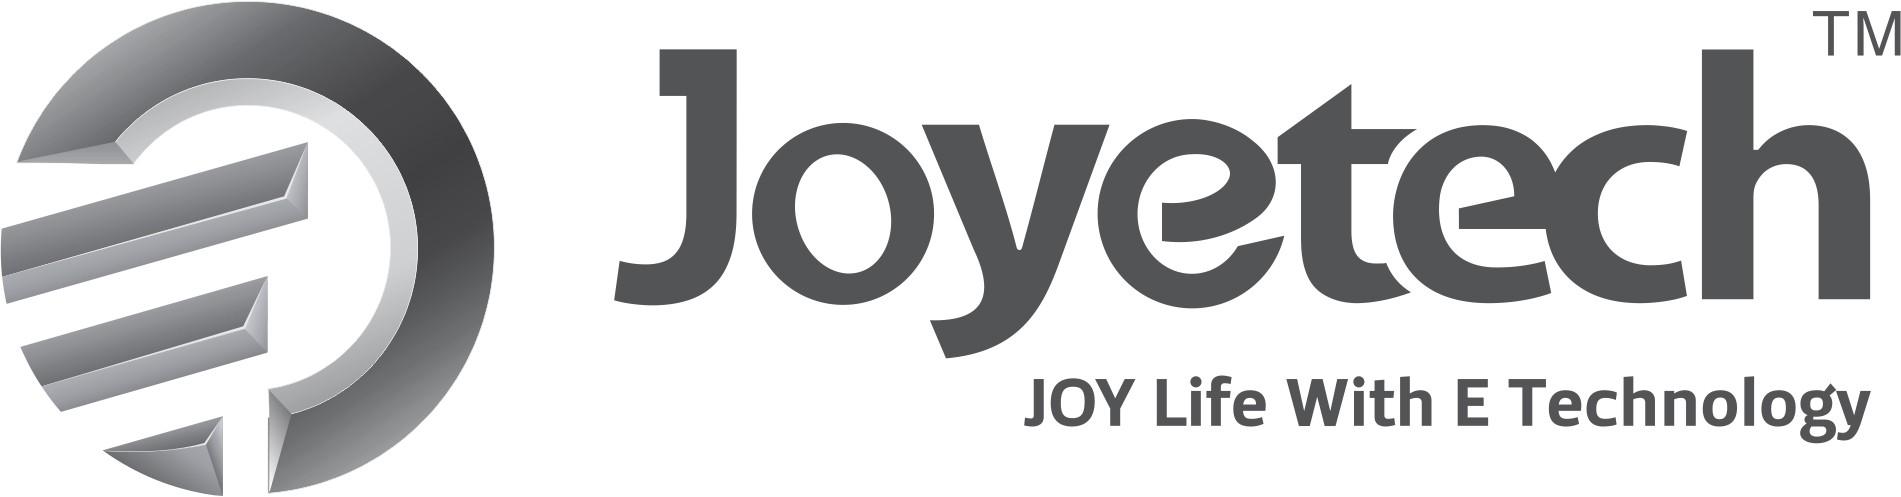 joyetech-large-logo-vapeport